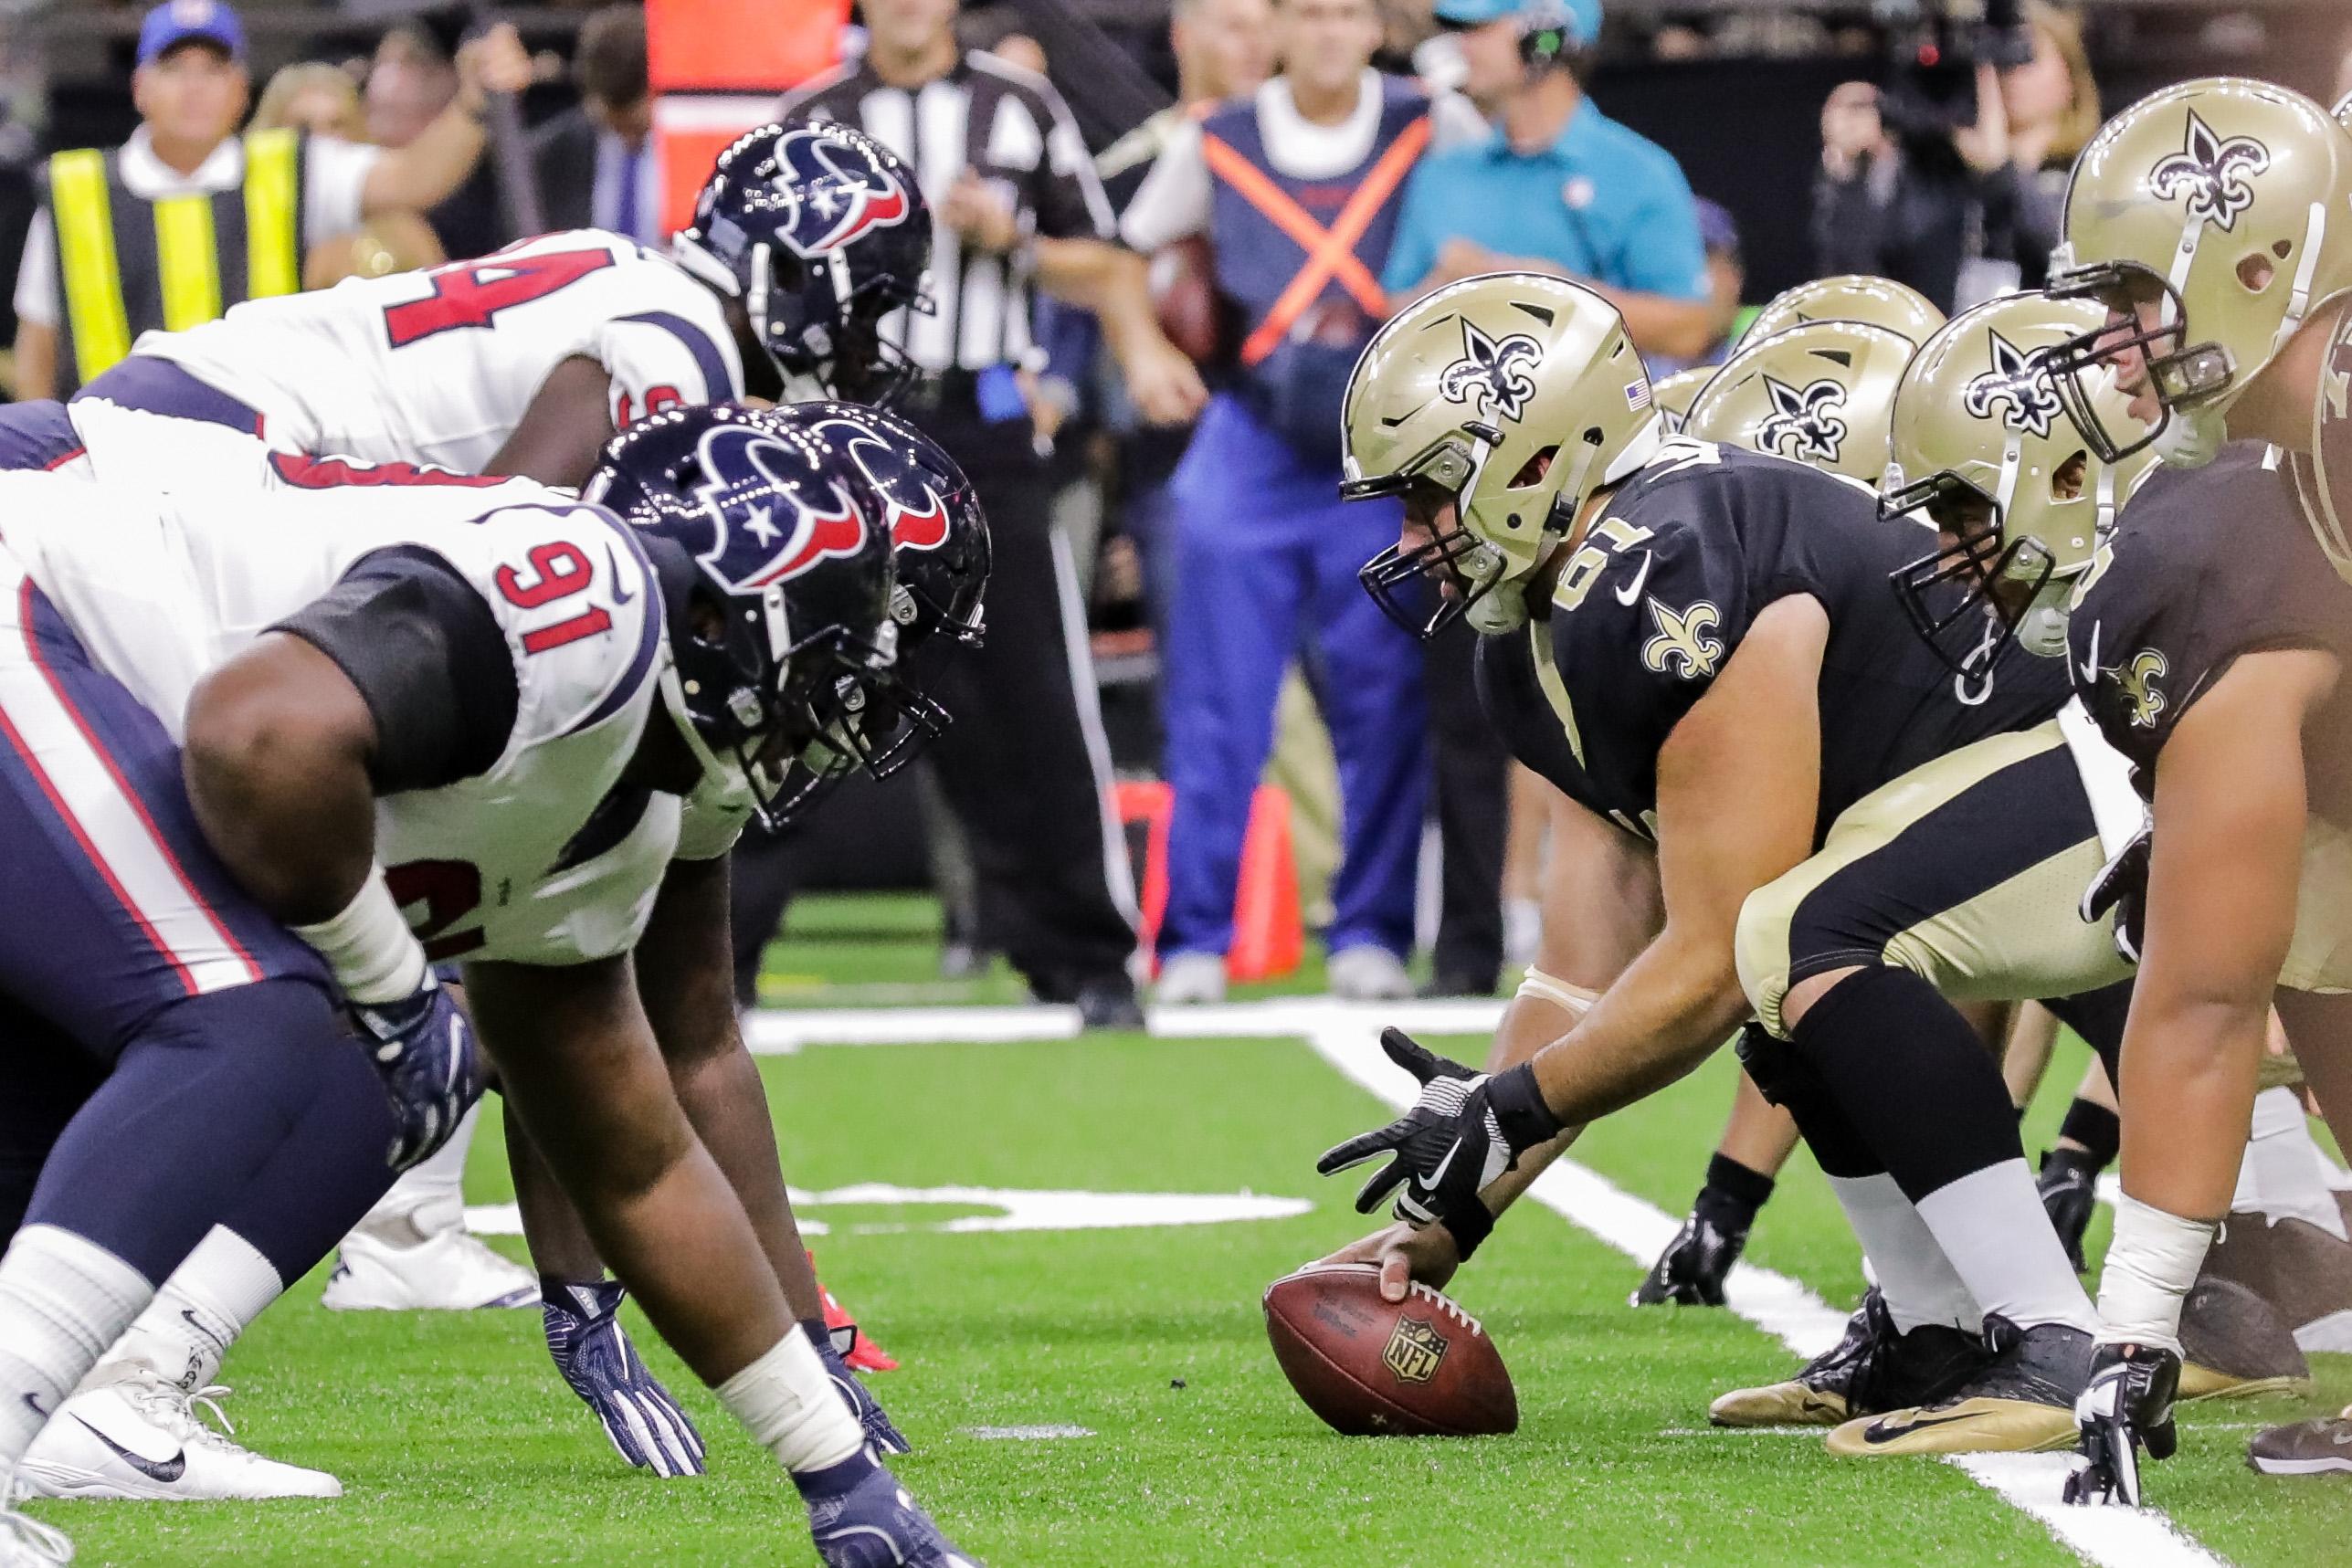 NFL: Houston Texans at New Orleans Saints